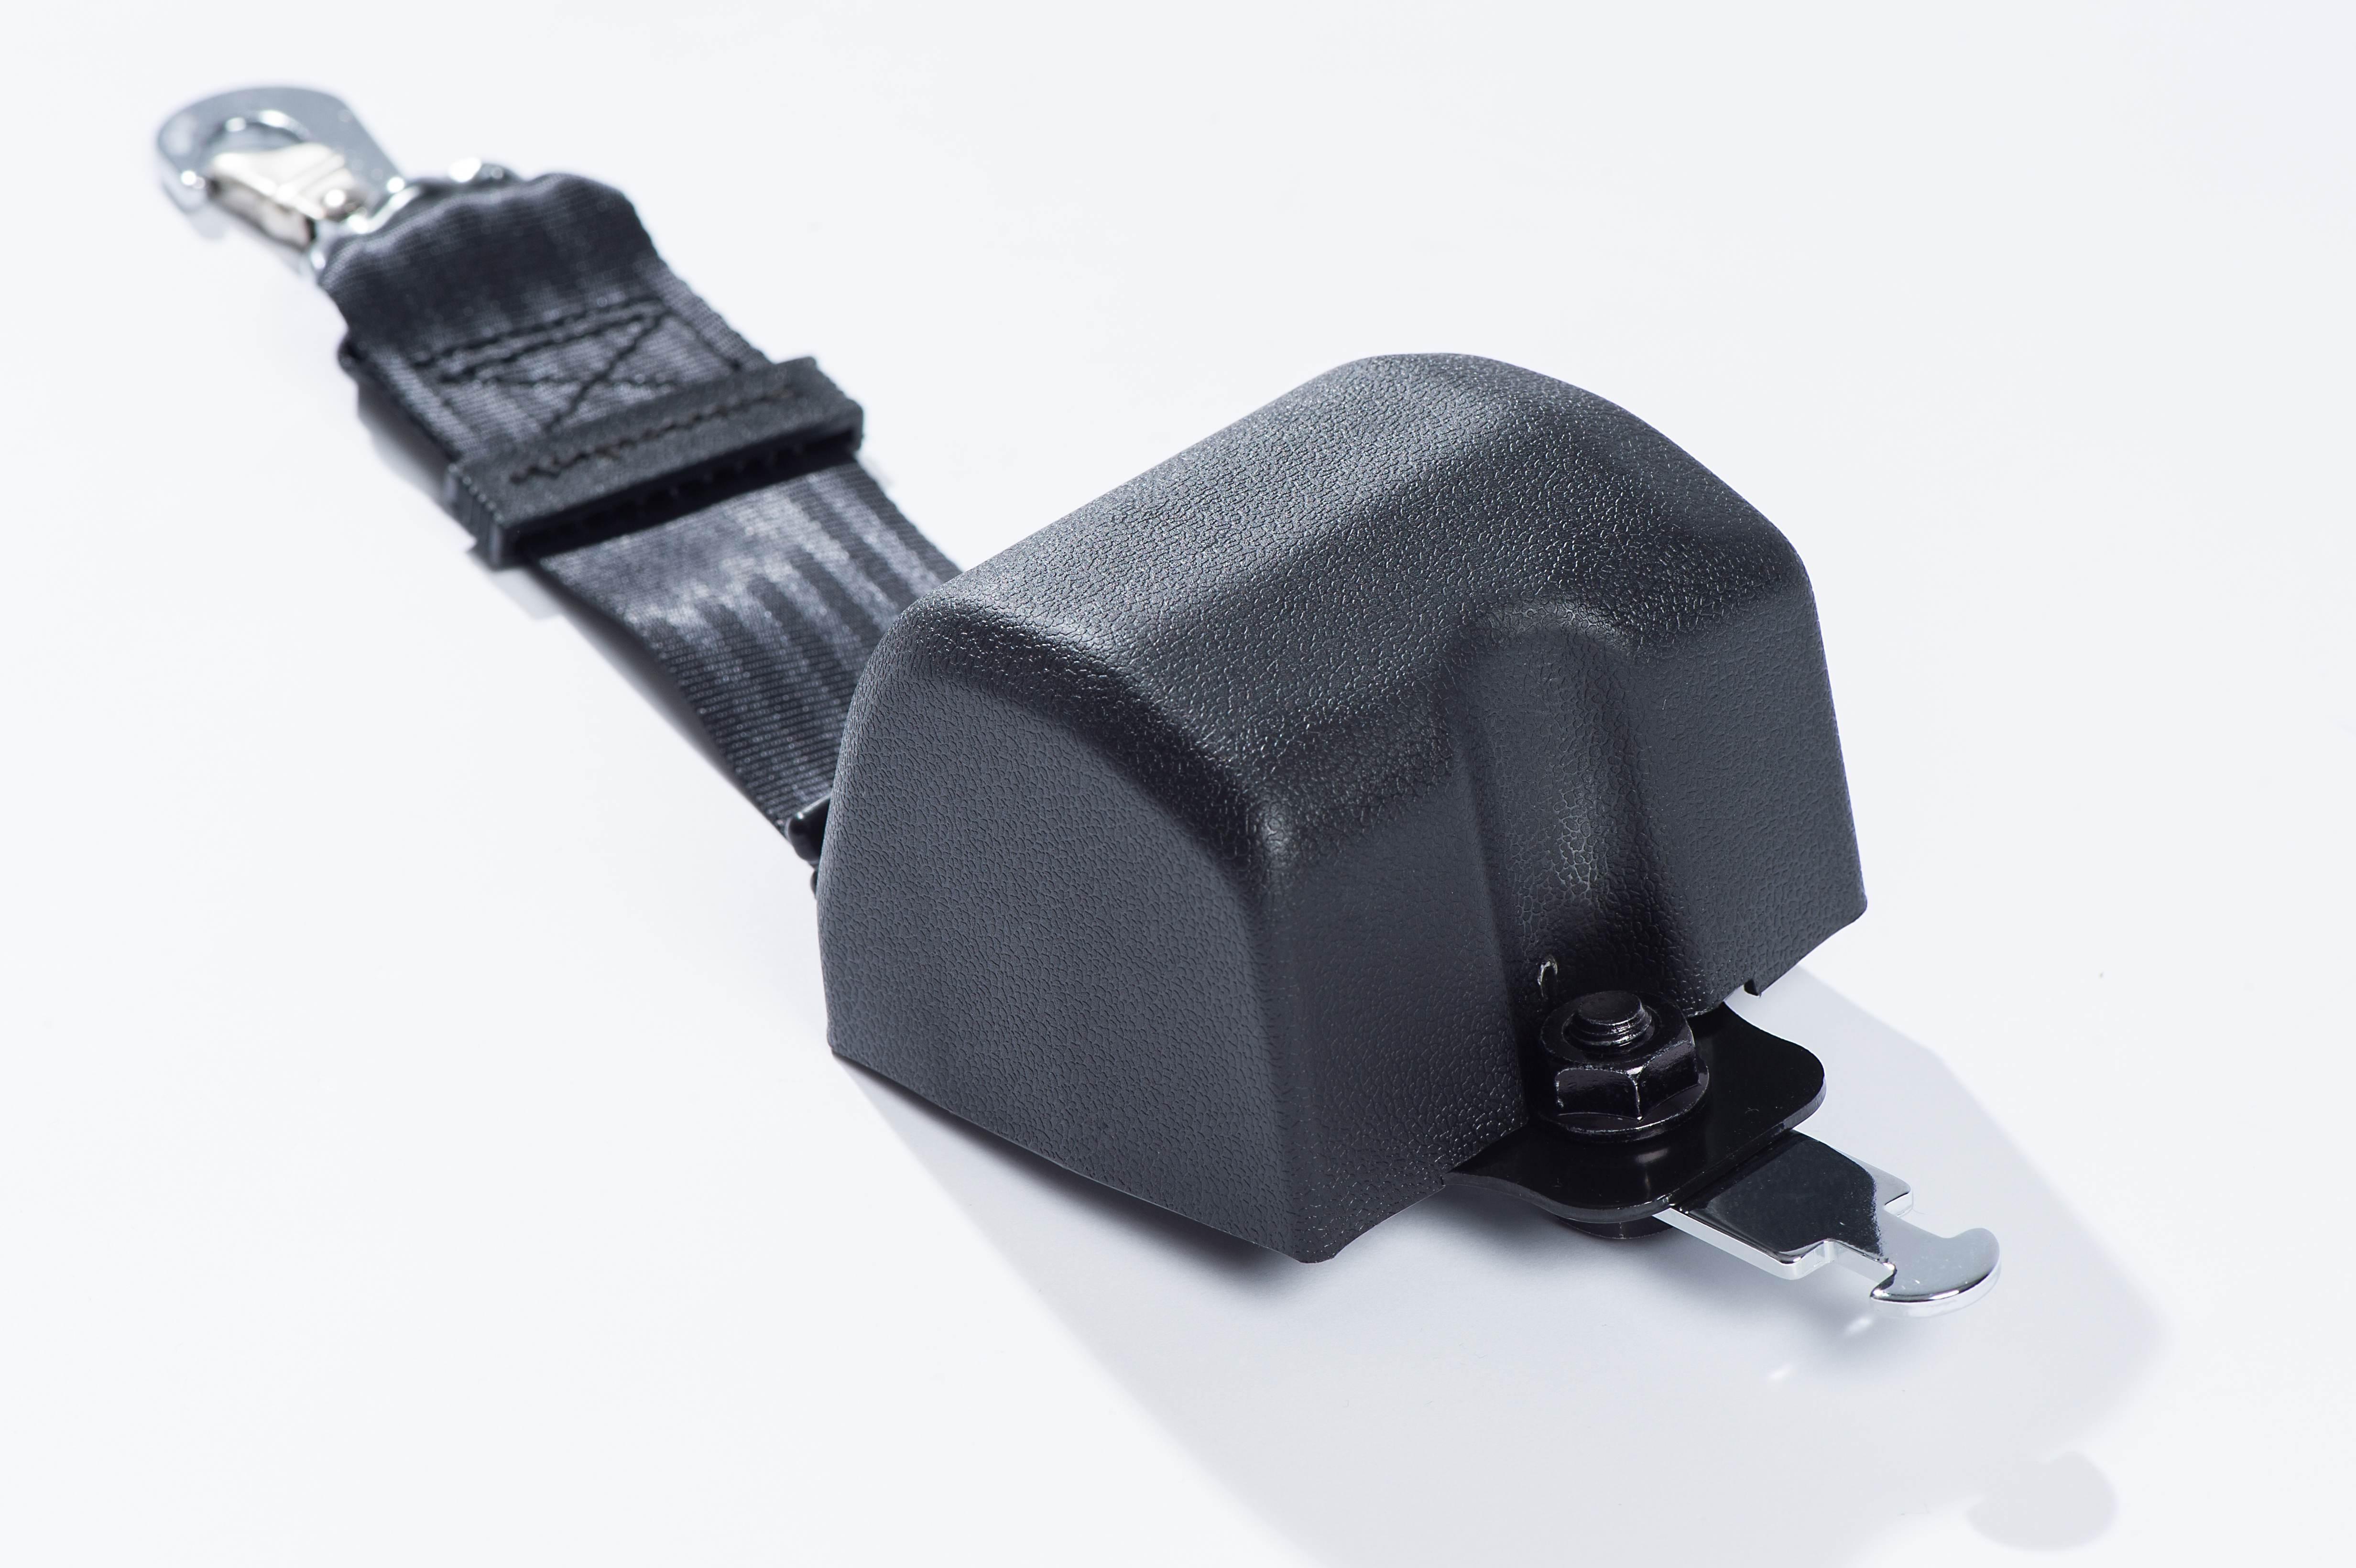 HavanaYZ 8U0857562 8E0857562 Kunststoff grau Sonnenblende Clip Haken Halter f/ür Audi 2013-2015 grau